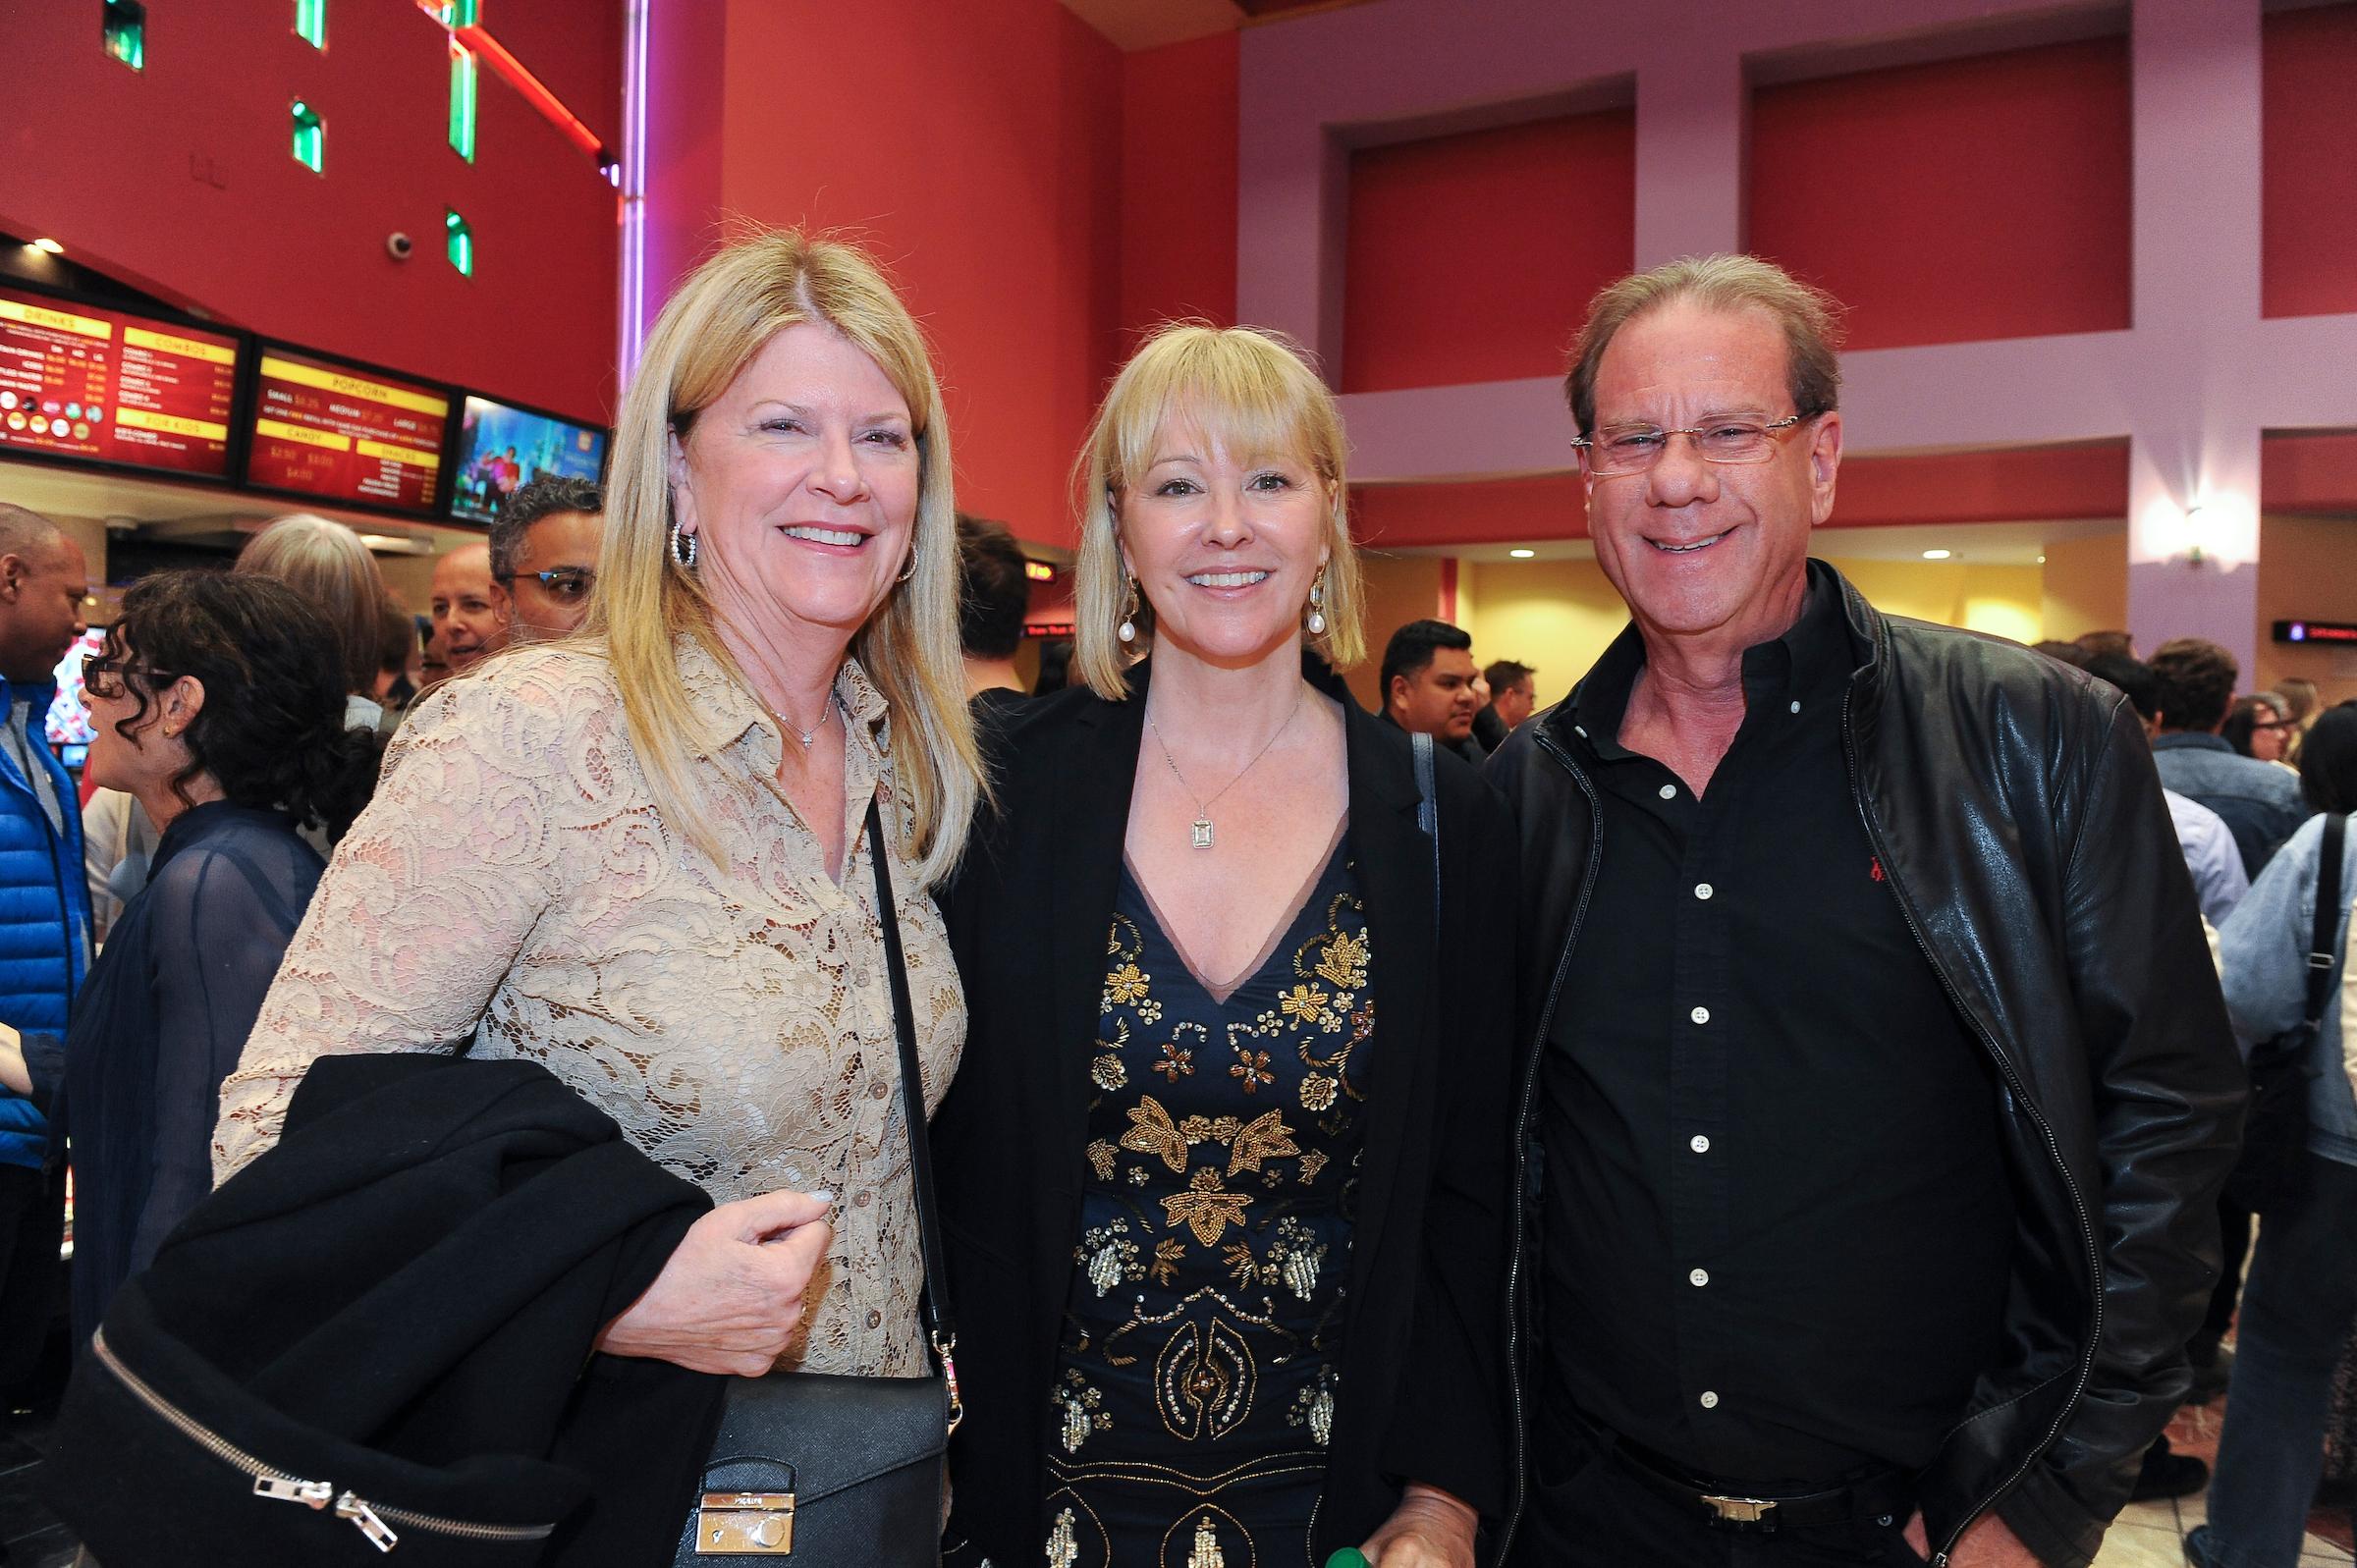 Saraola & Danny MacGregor with Director, Kerry David